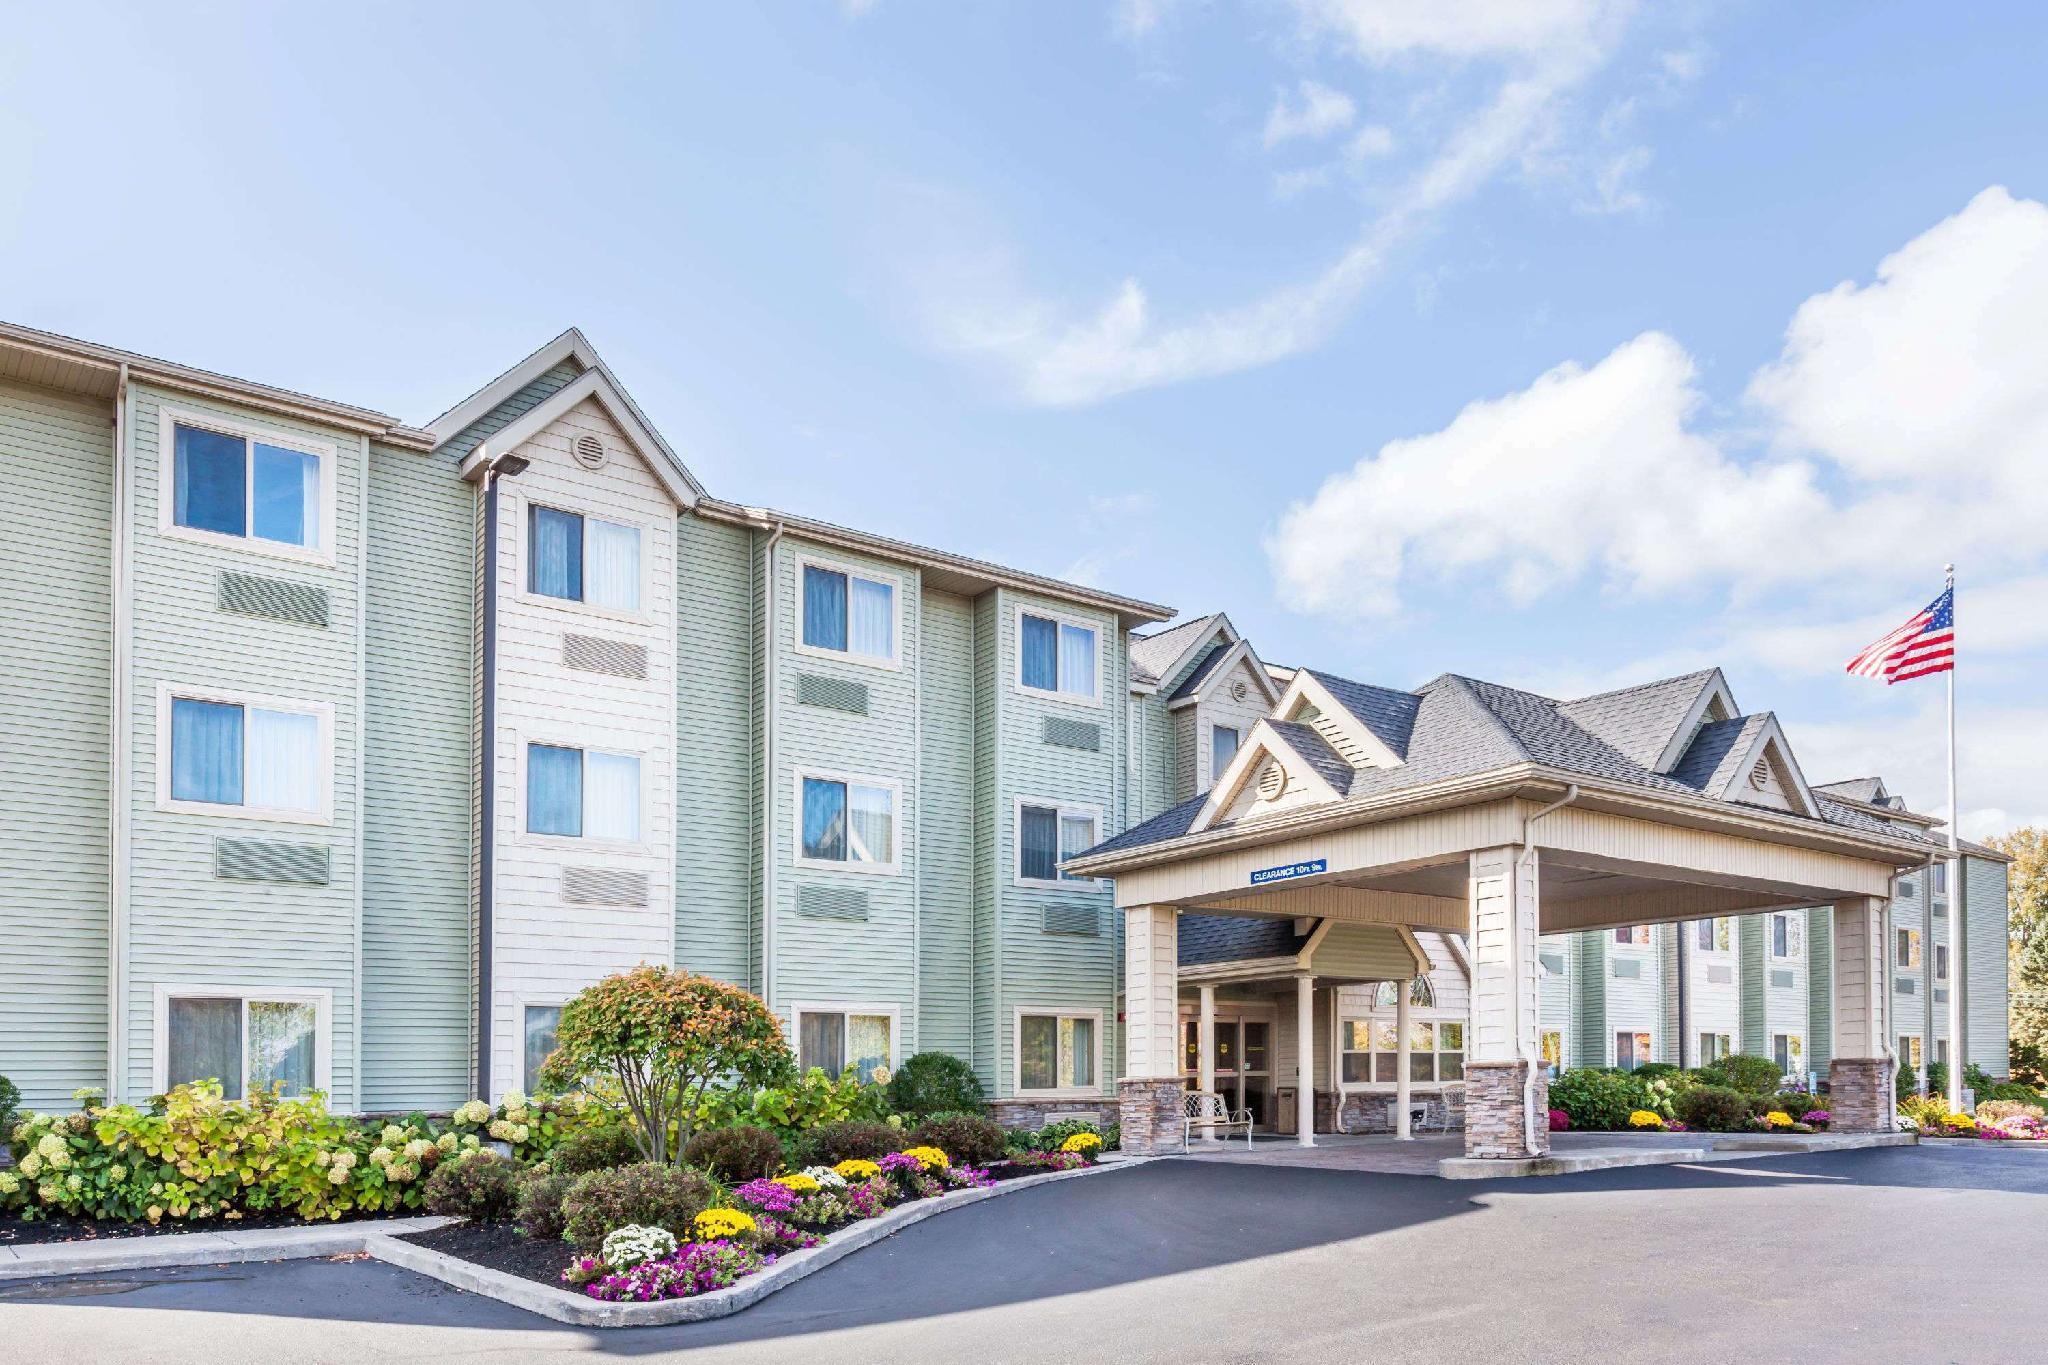 Microtel Inn And Suites By Wyndham Verona